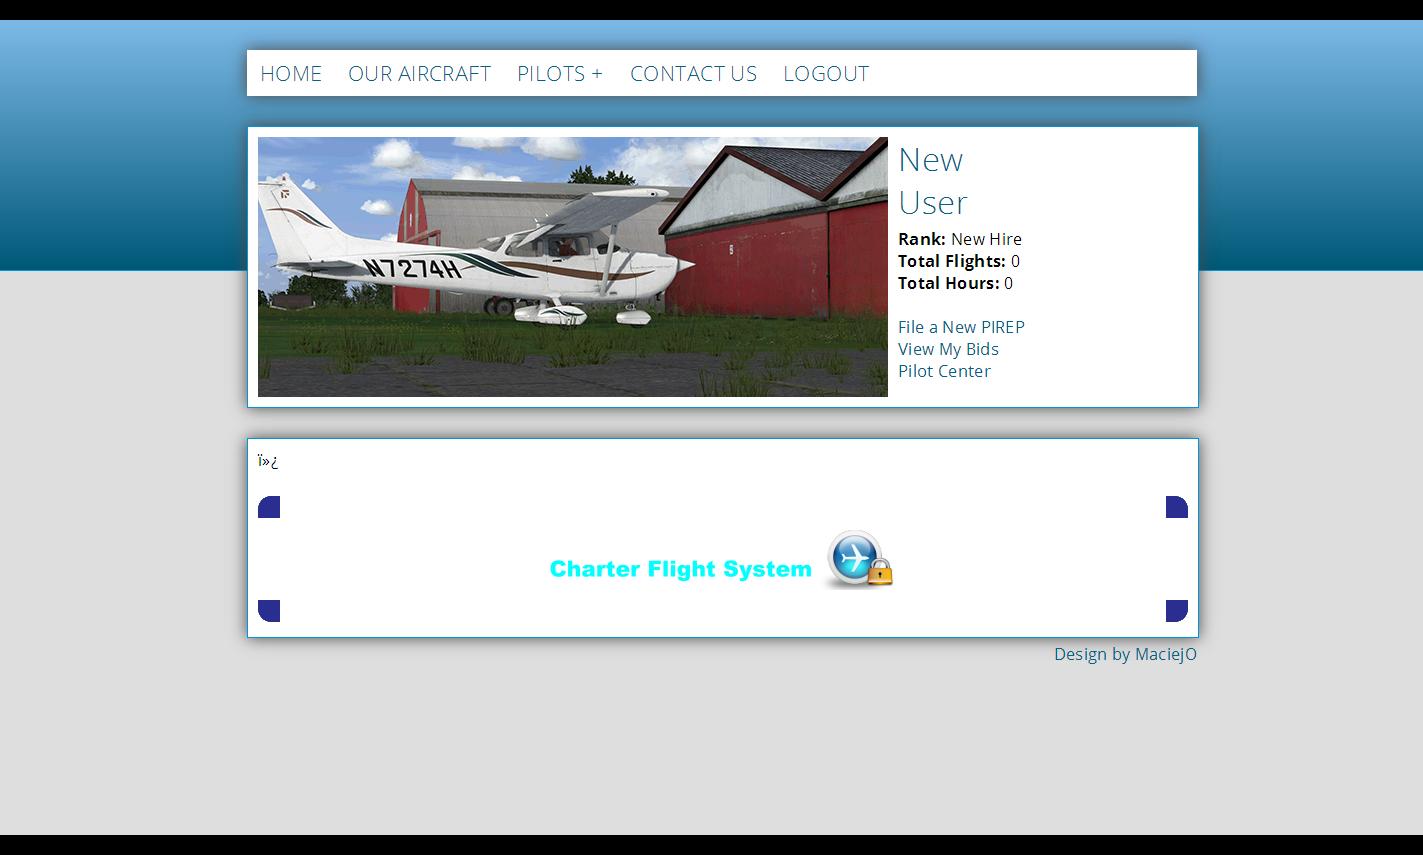 charterflightsystem-fq3sm7.png